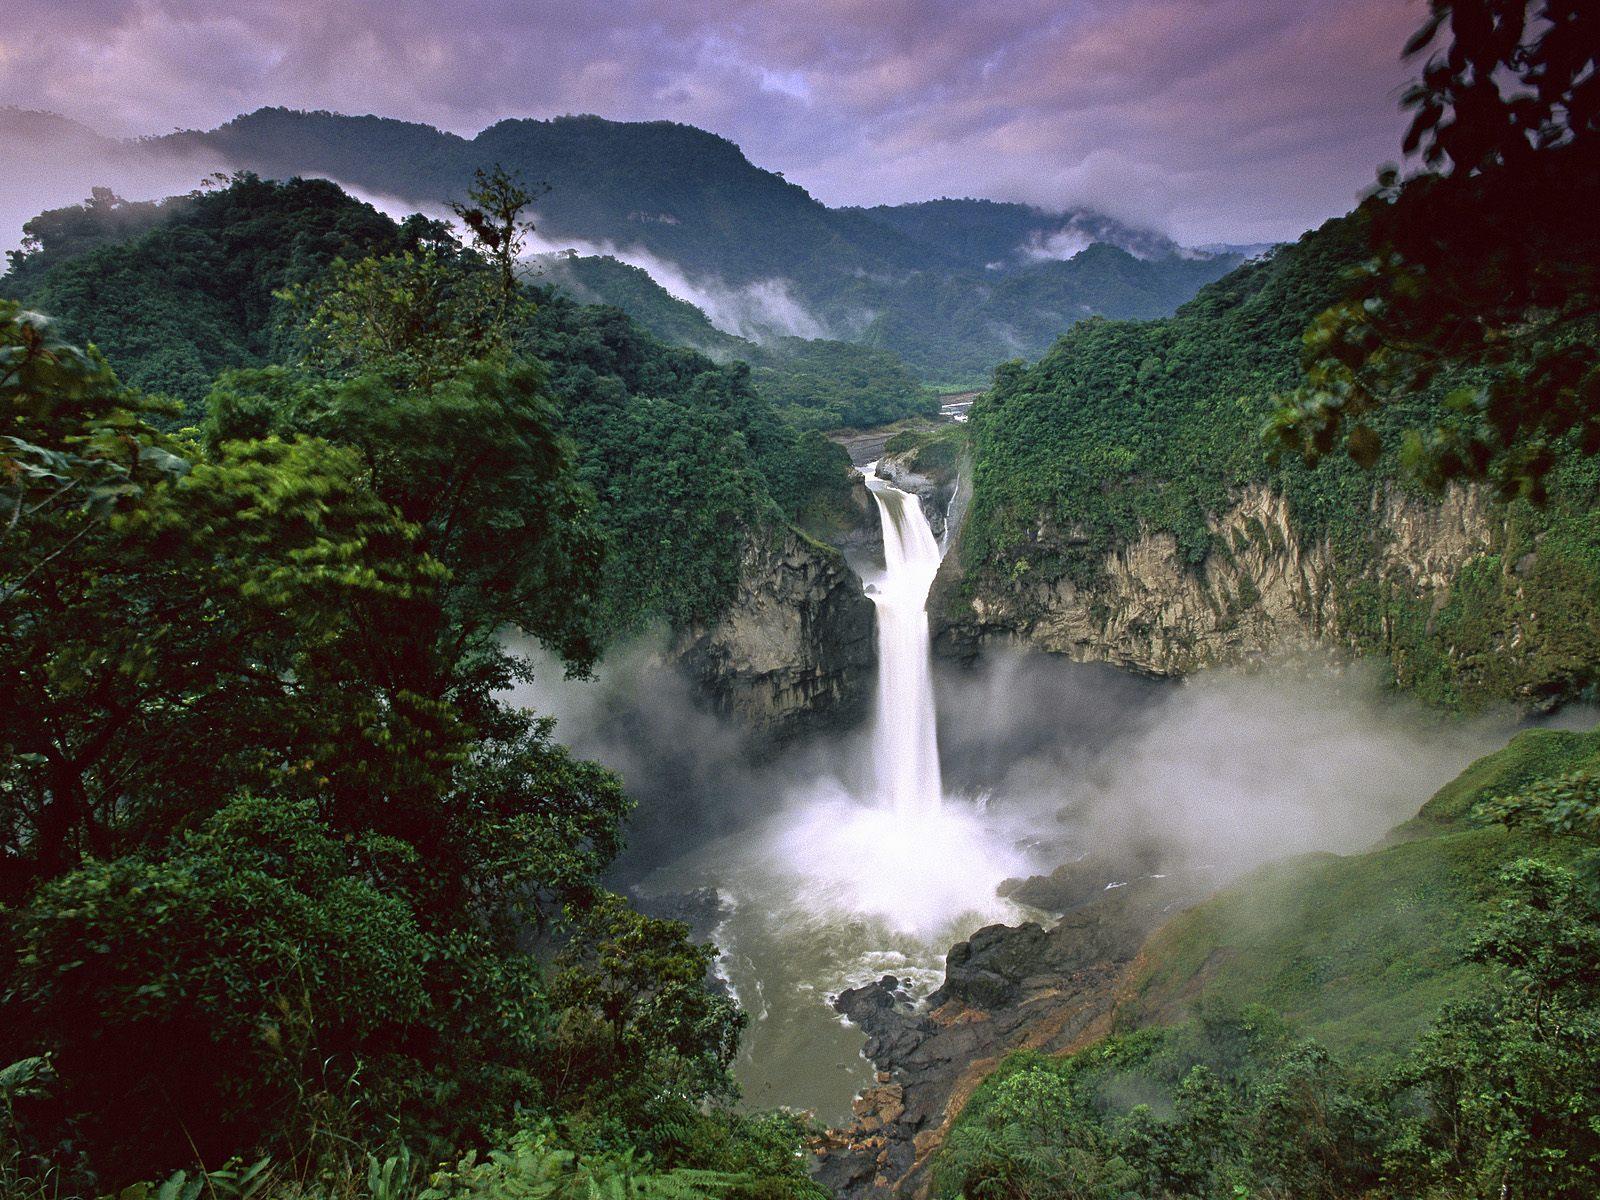 amazon rainforest south america - photo #5